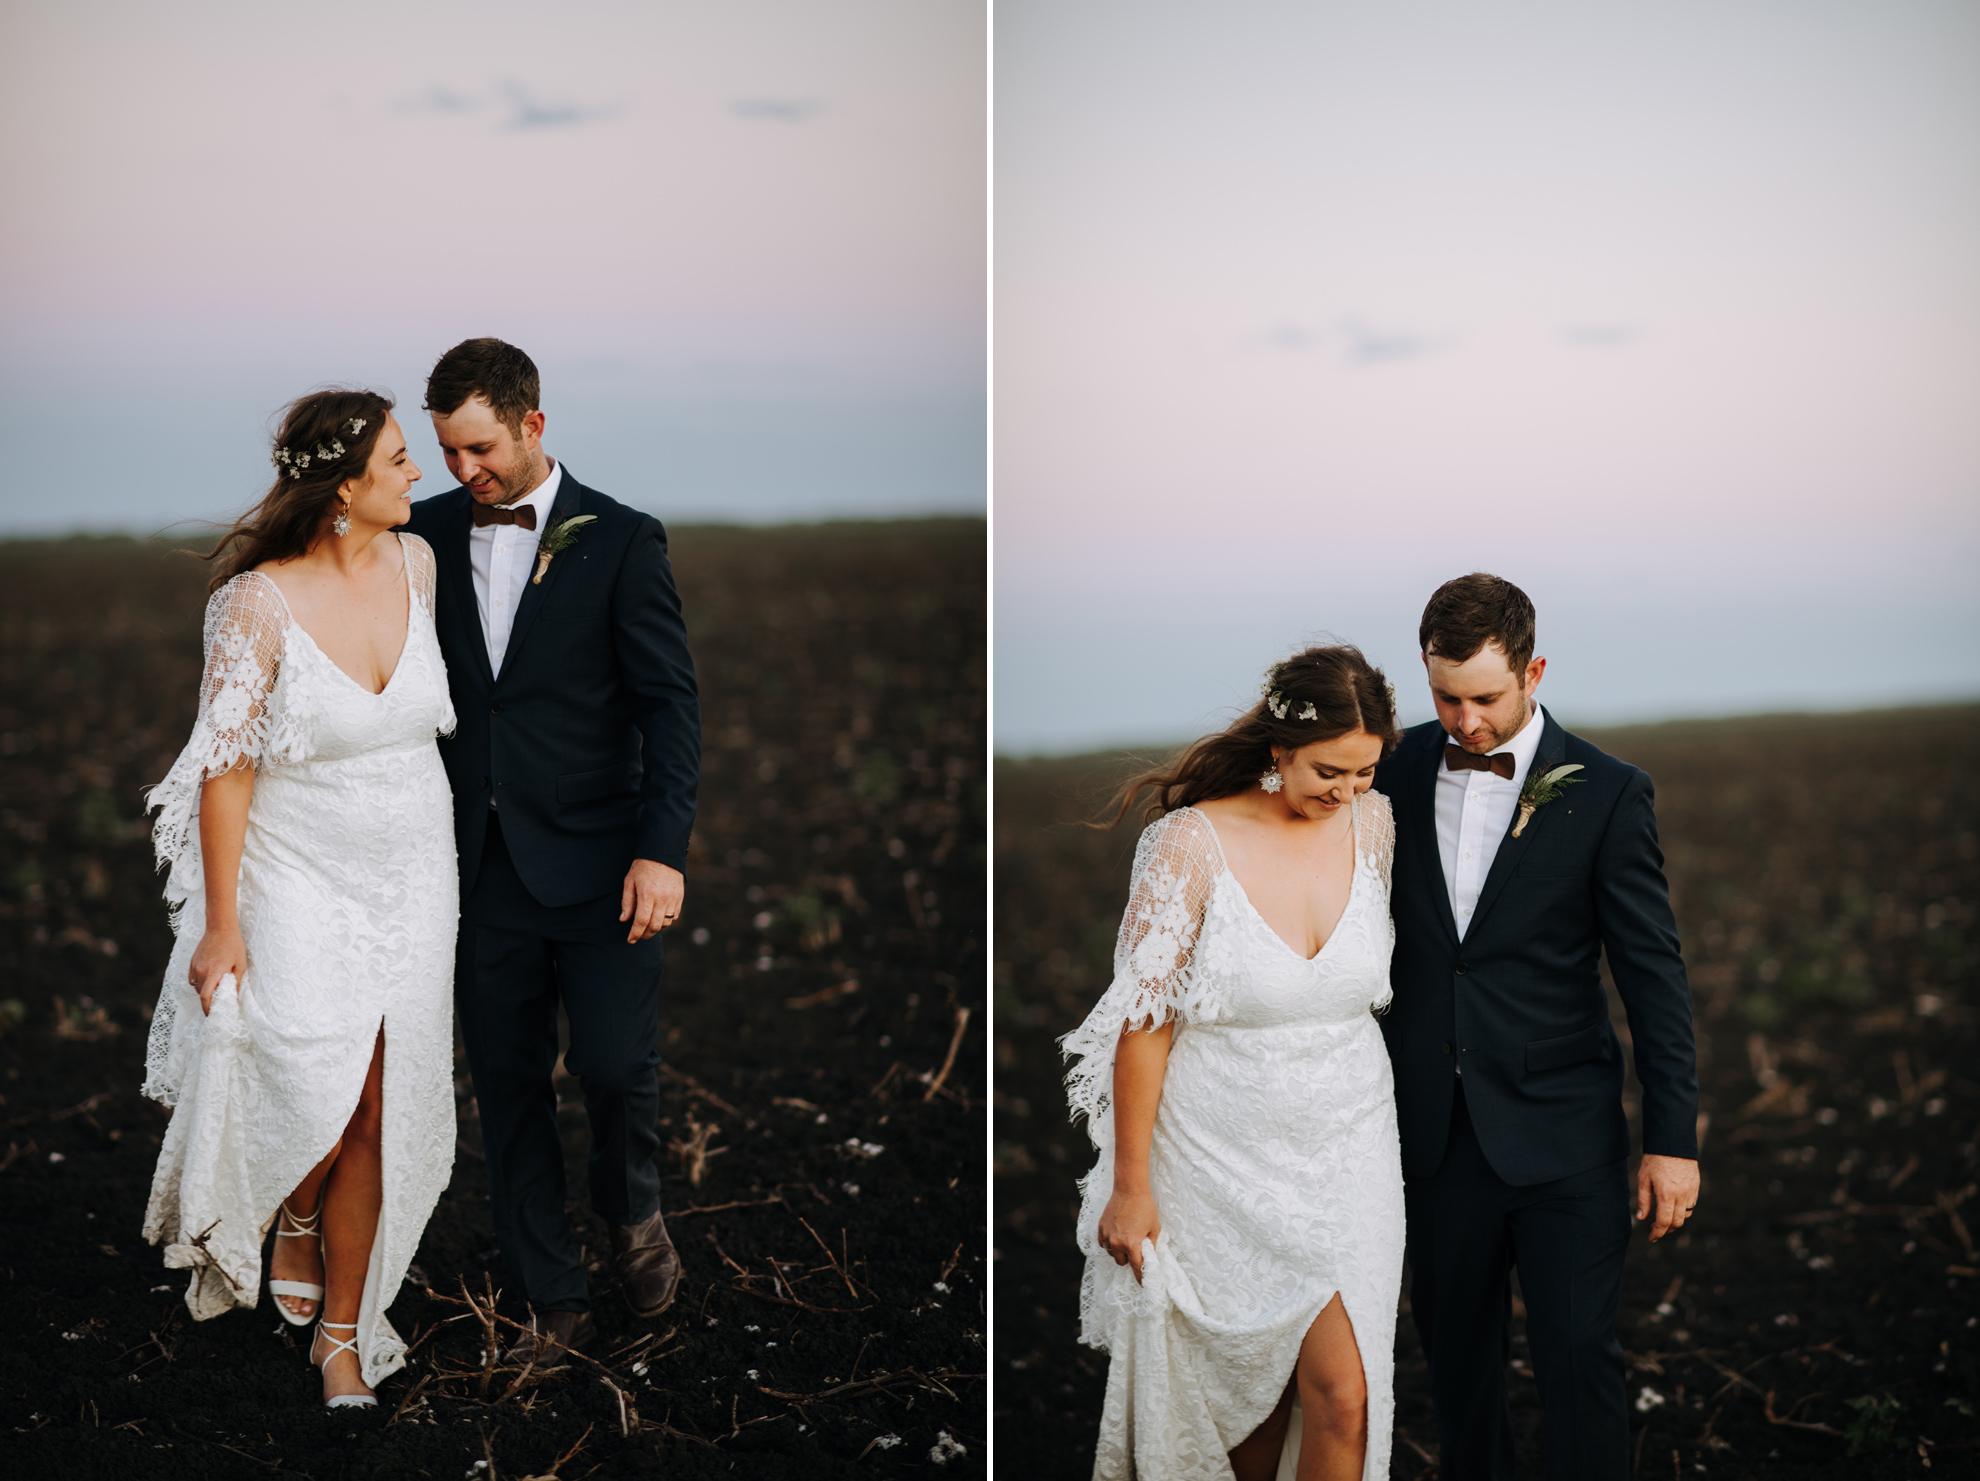 072-Jason_Jessie_Dalby_Country_Wedding.jpg